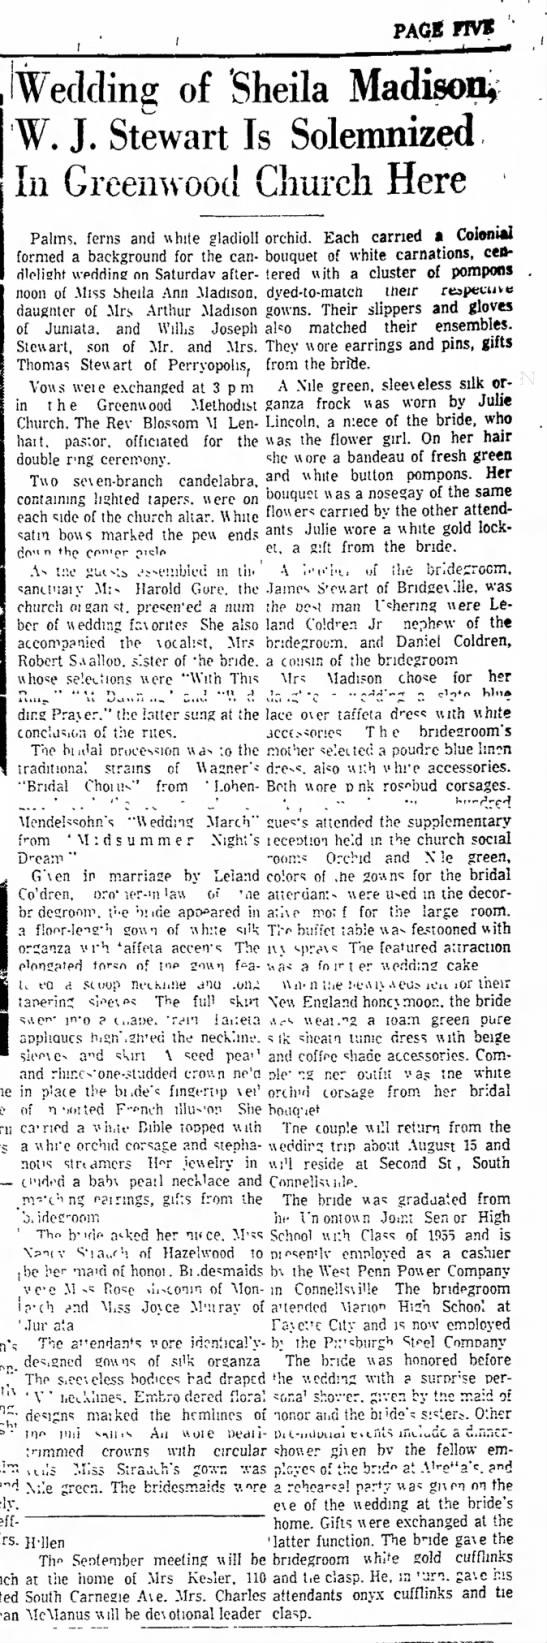 daily courier 8/8/60 - sheila madison stewart wedding announcement -